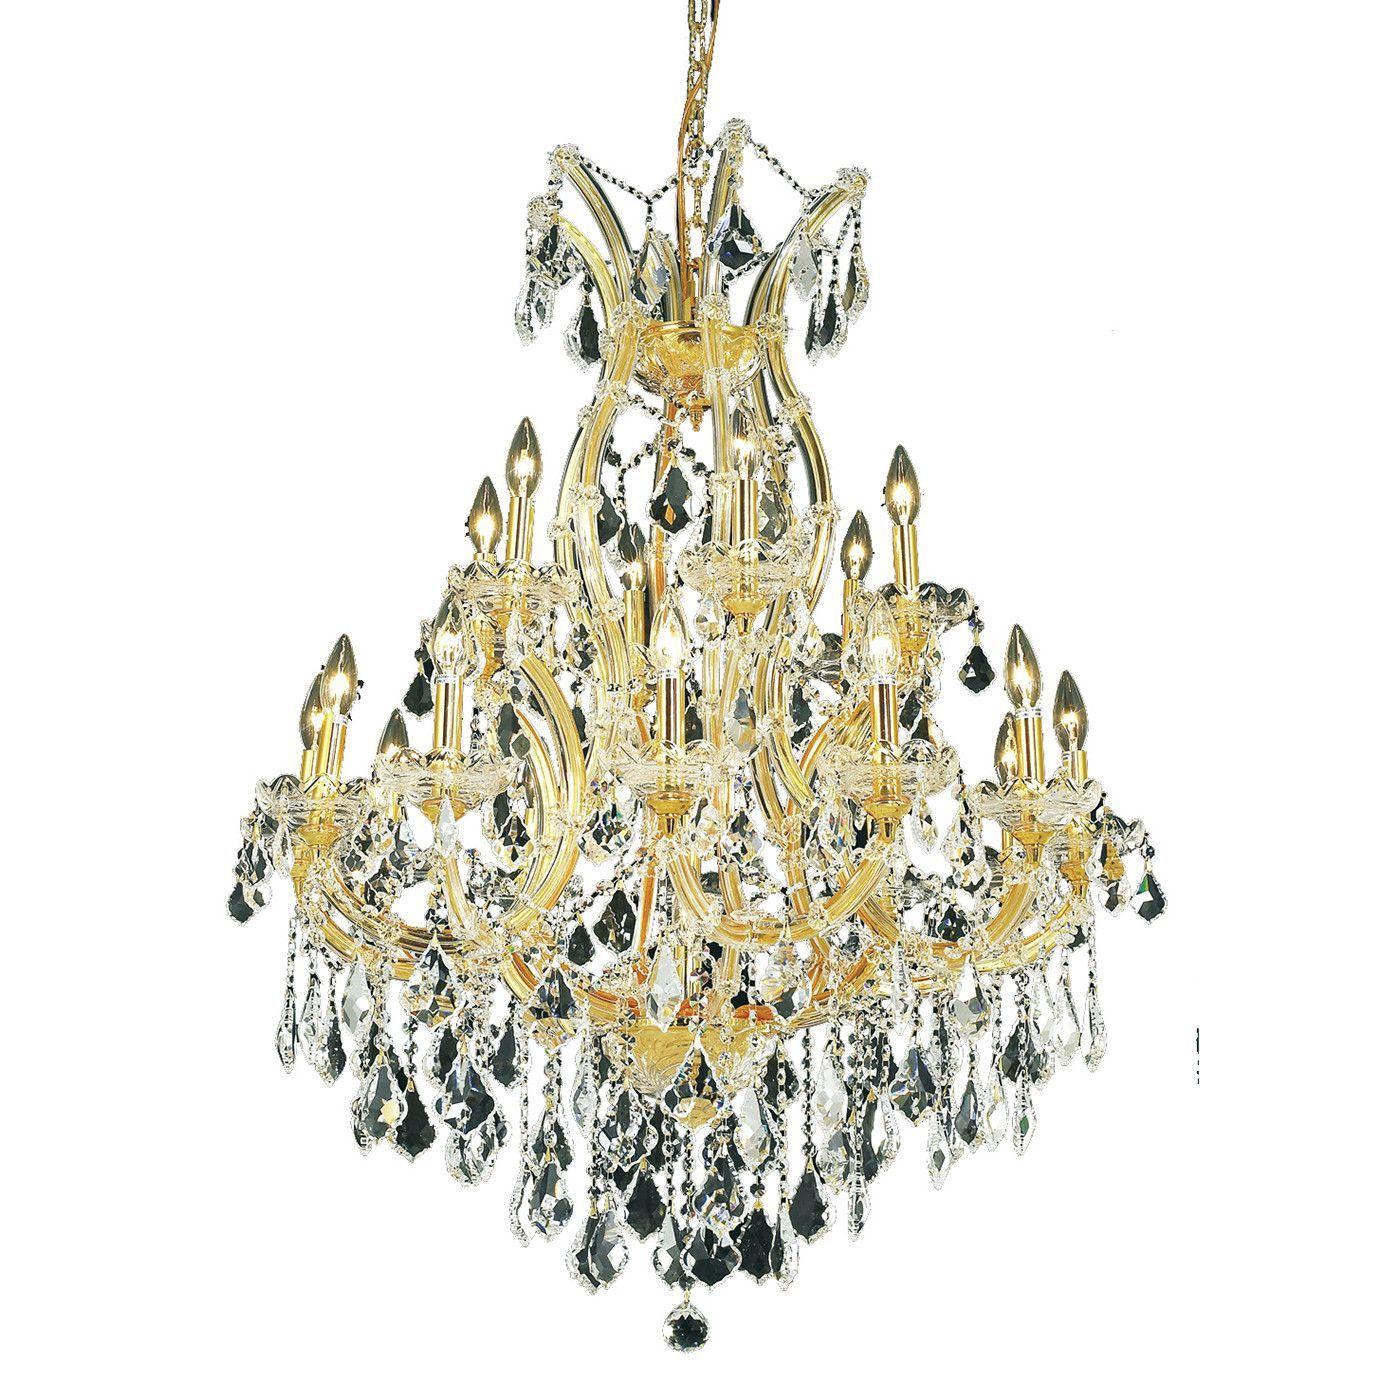 "Elegant Lighting 2800D32G/EC Maria Theresa Collection Dining Room Hanging Fixture D32"" x H42"" Gold Finish (Elegant Cut Crystal)"